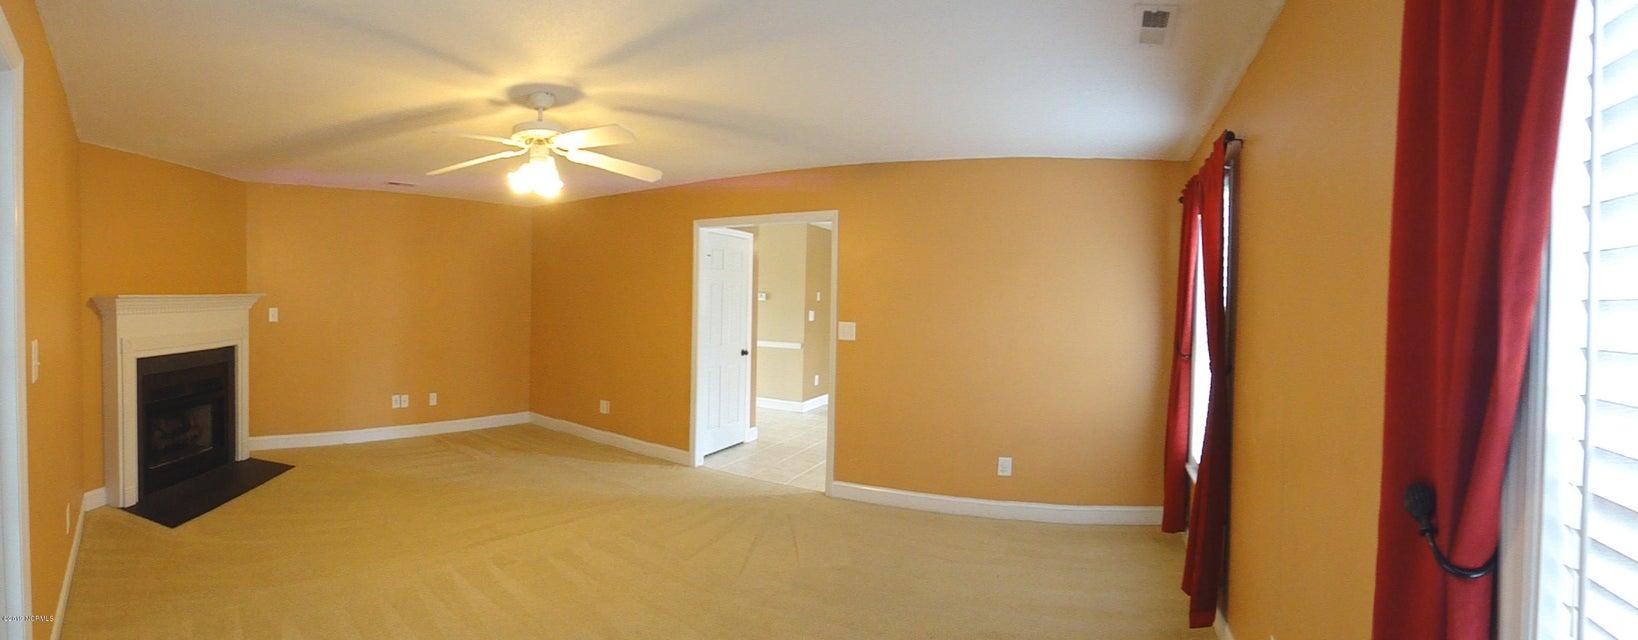 120 Trailwood Drive, Hubert, NC, 28539   MLS #100145544